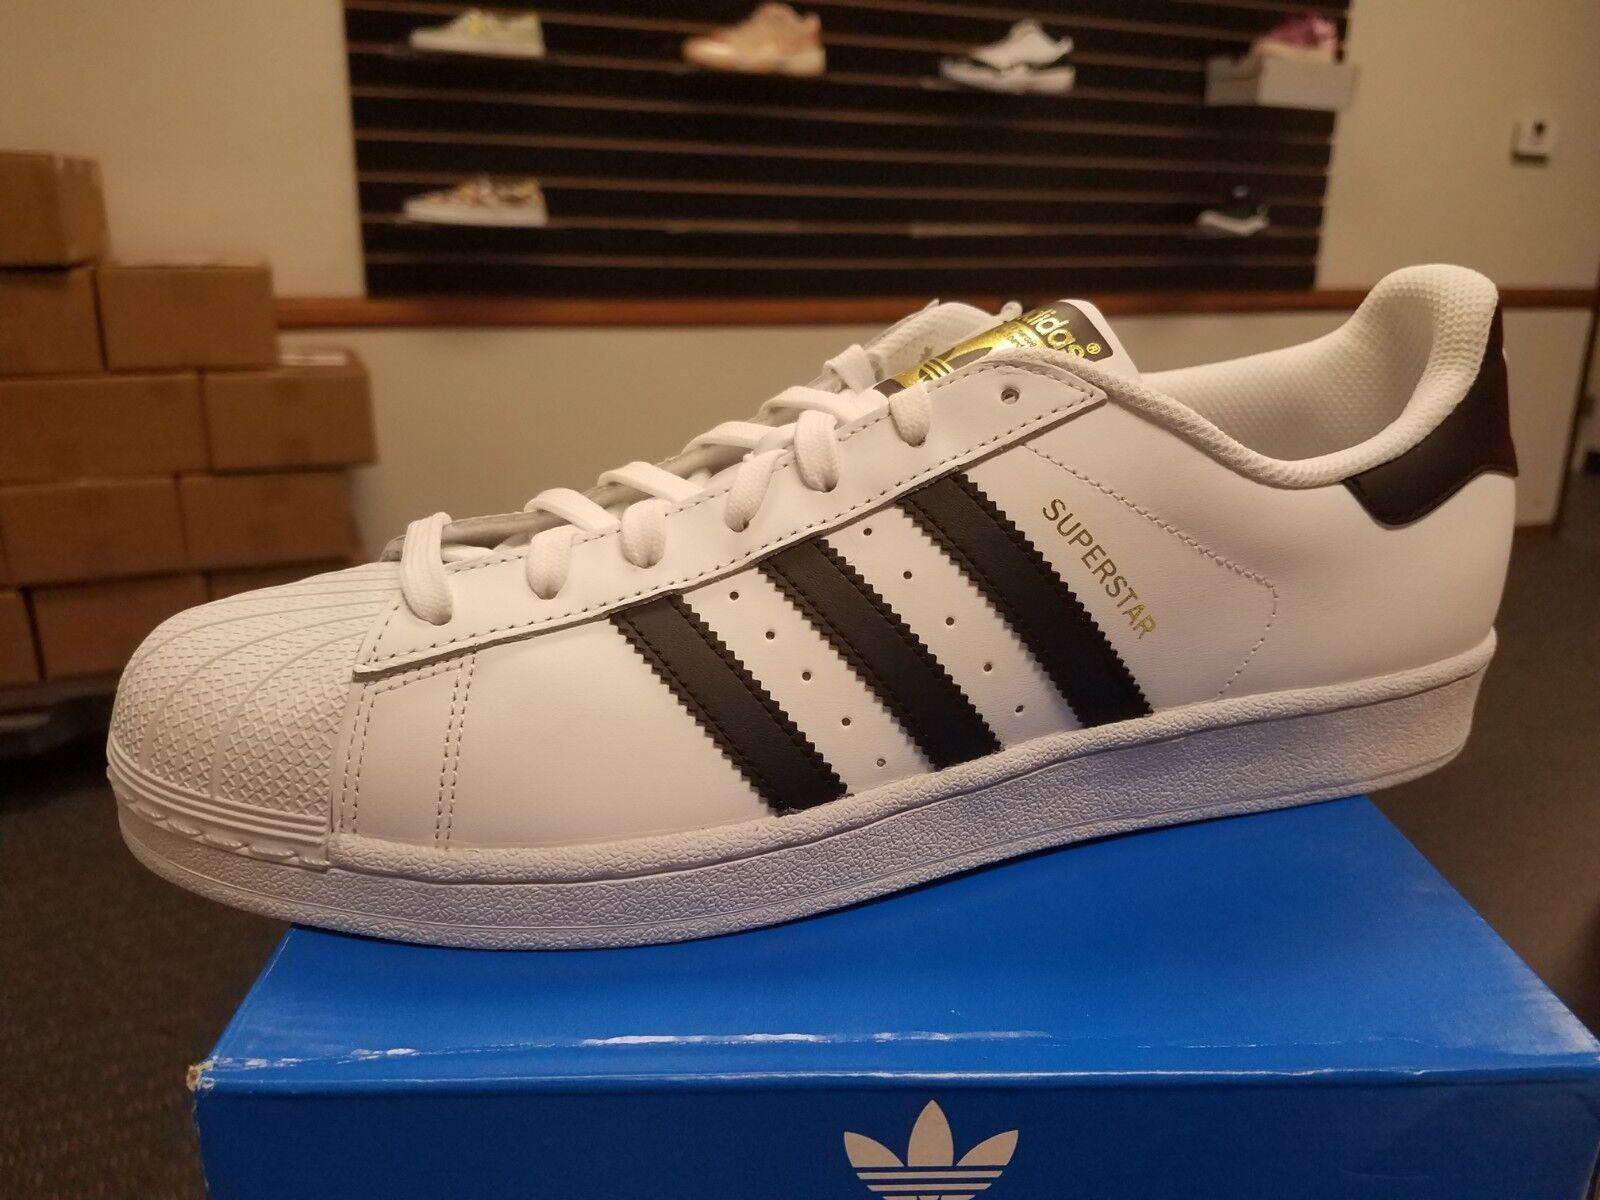 Brand New in Box Adidas Men's Super Star Basketball C77124 WHITE BLACK gold